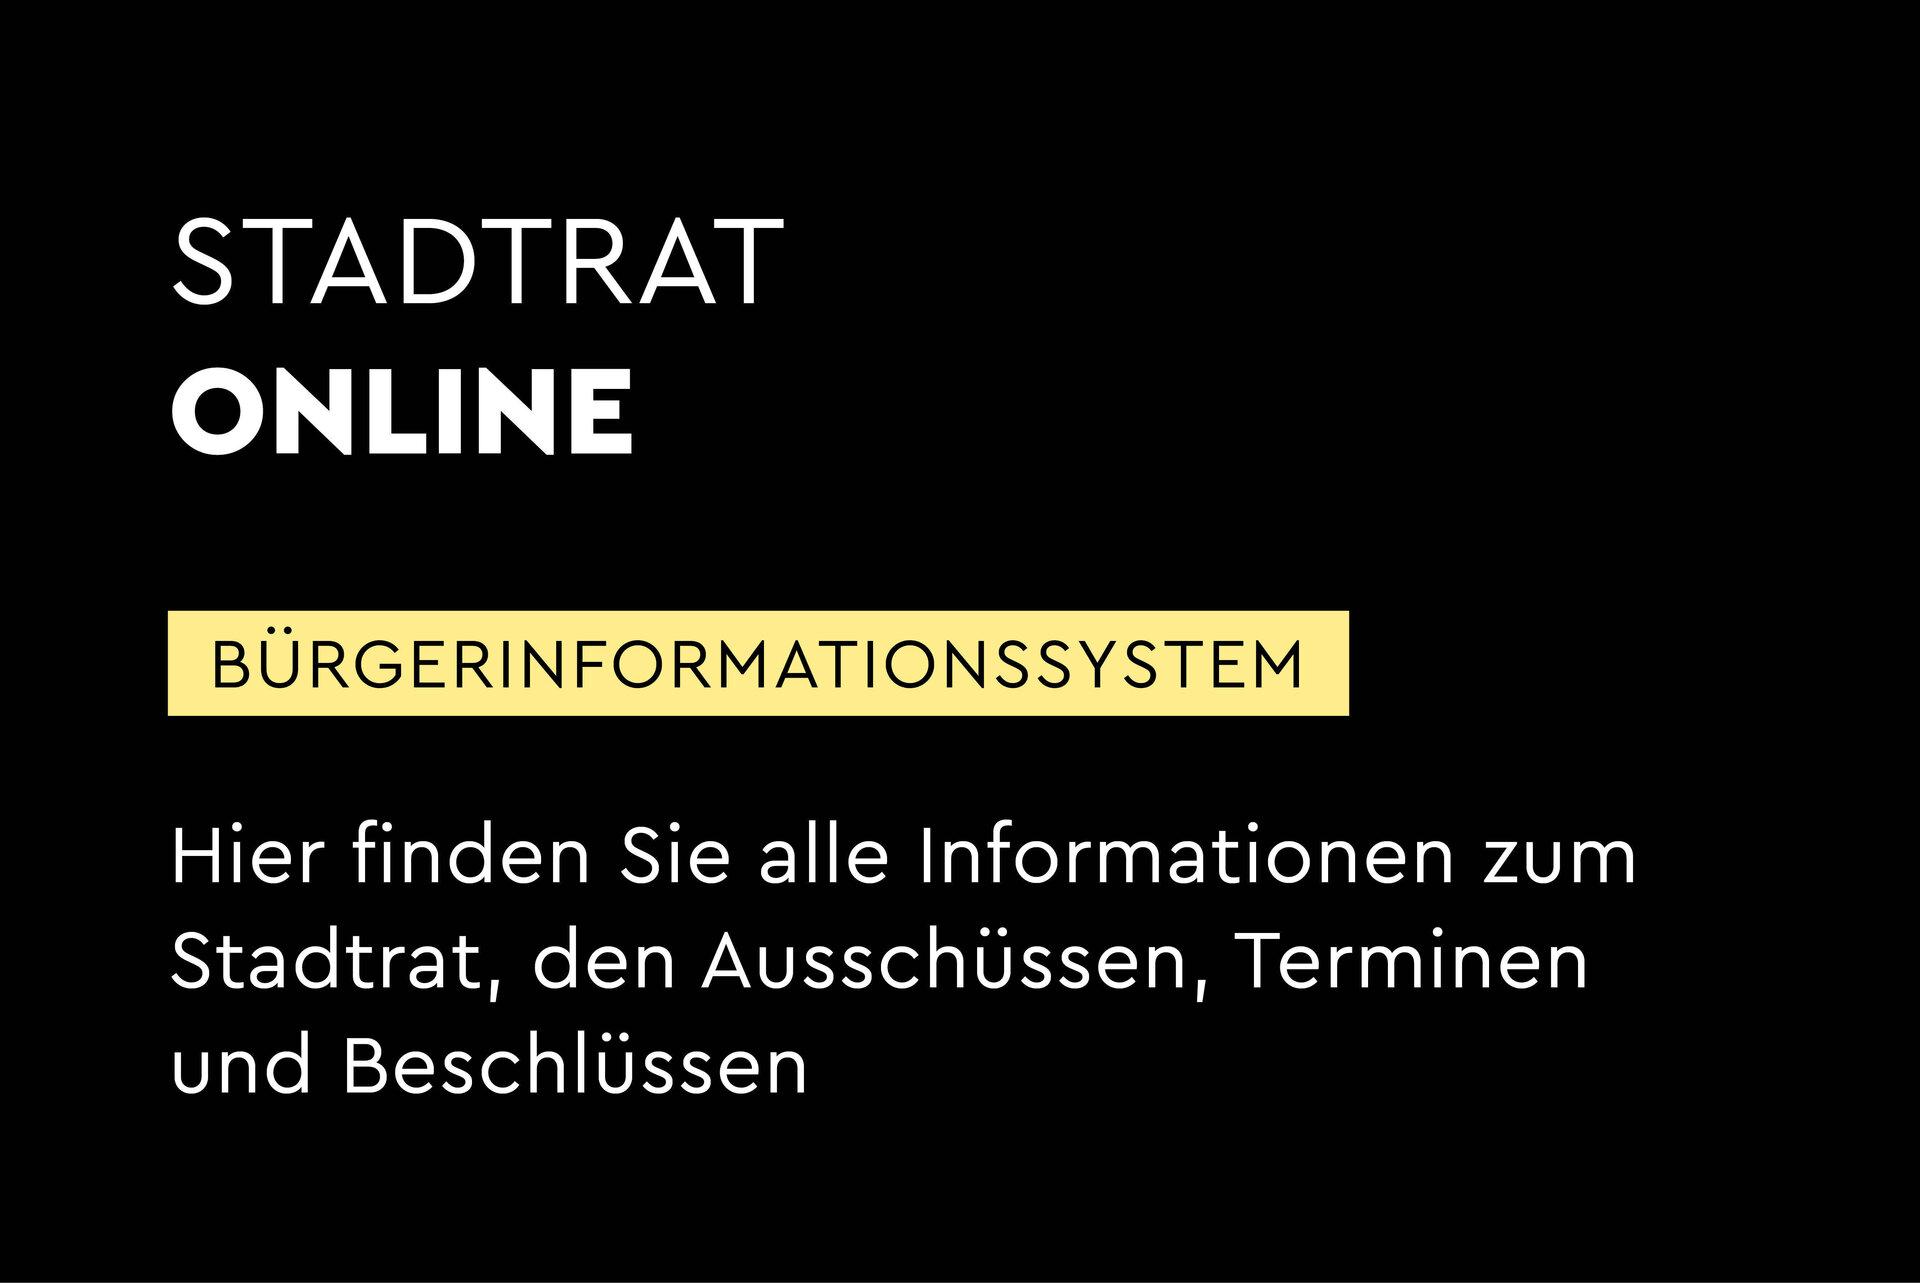 Bürgerinformationssystem